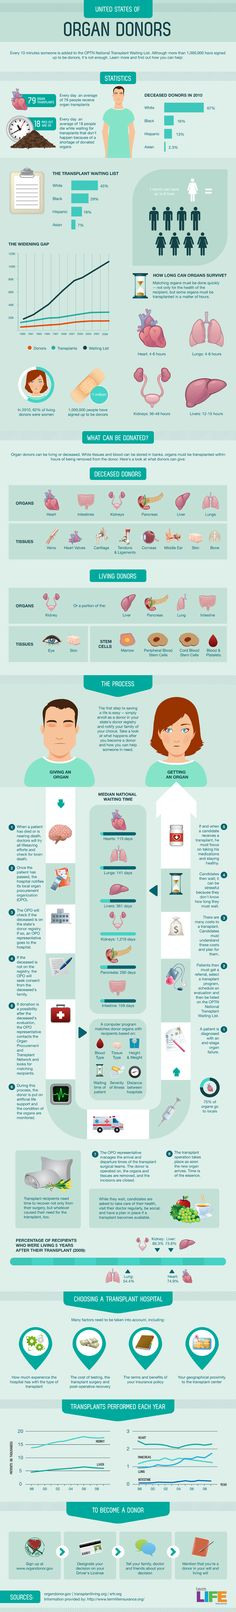 Organ Donation Statistics in US : Infographic